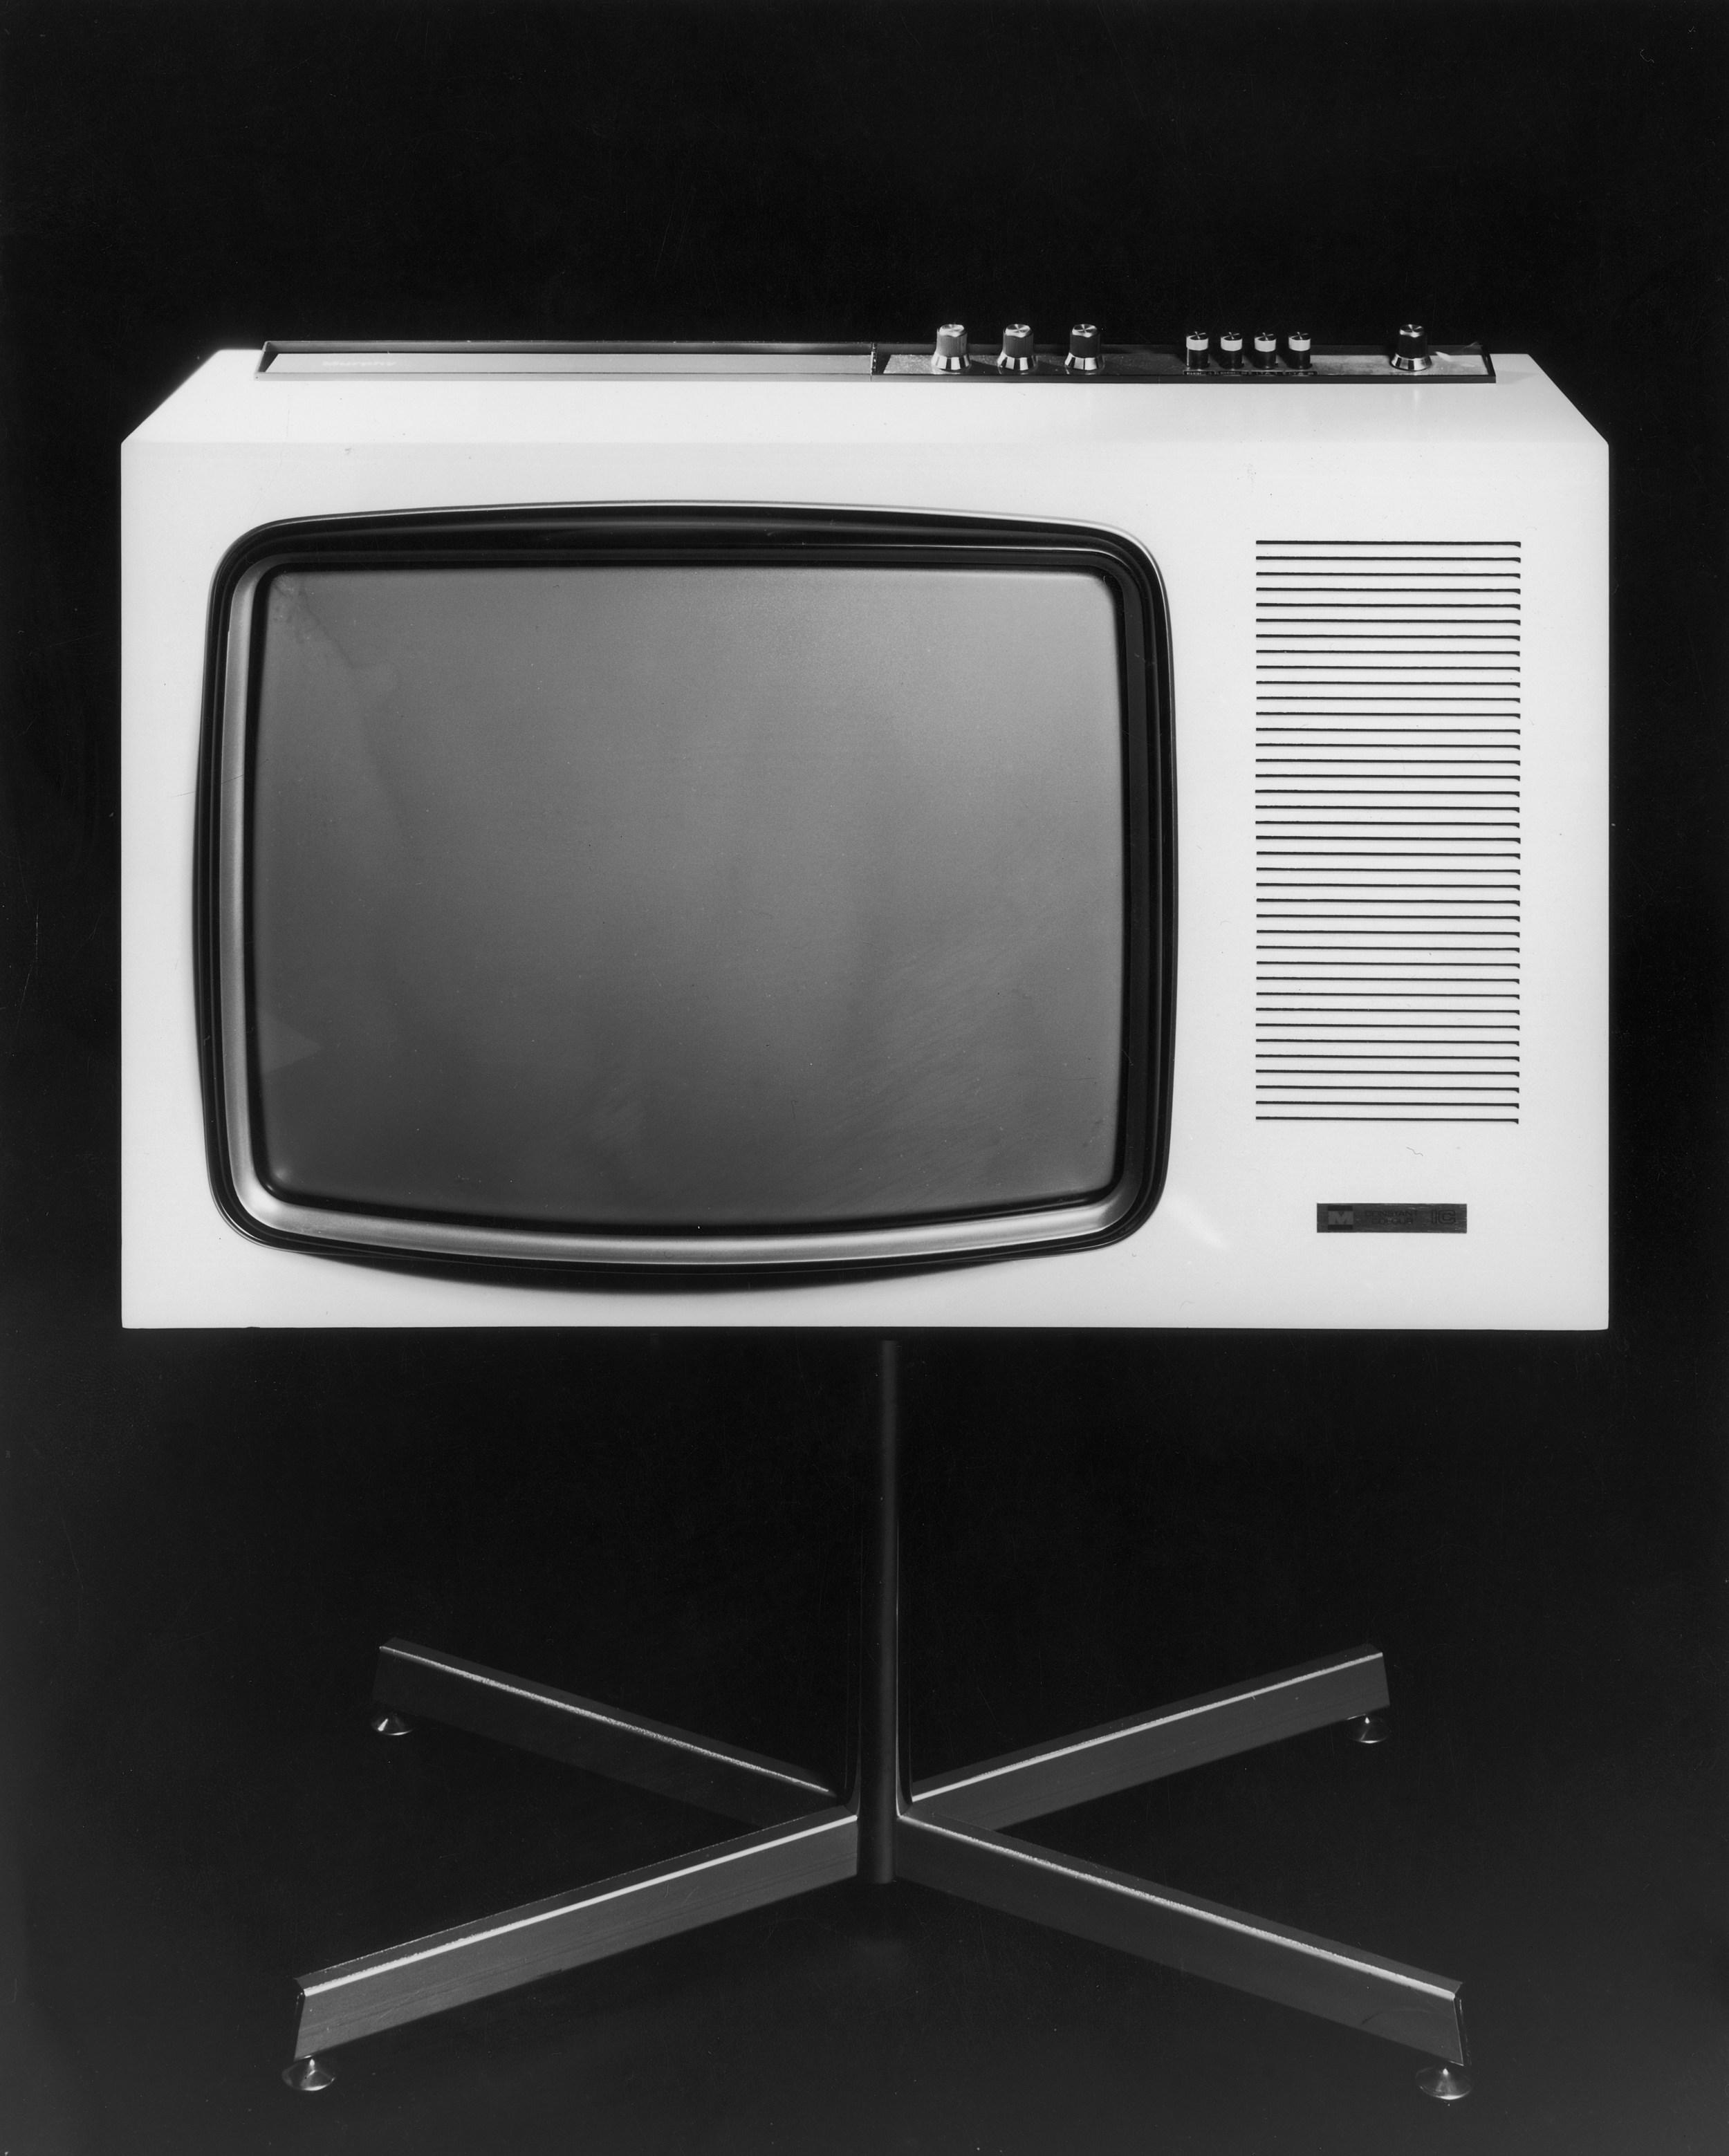 Nostalgic TV Commercials Bring Back More Christmas Memories ...